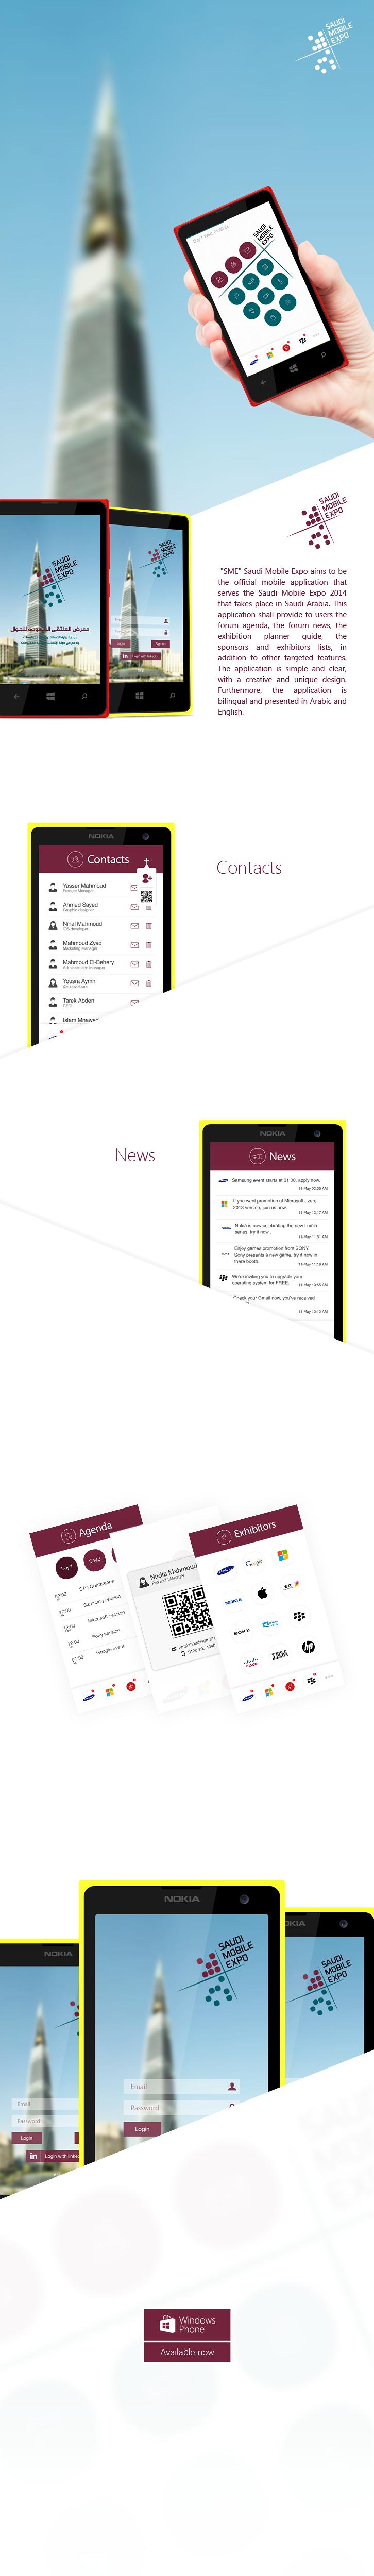 Saudi Mobile Expo windows phone App